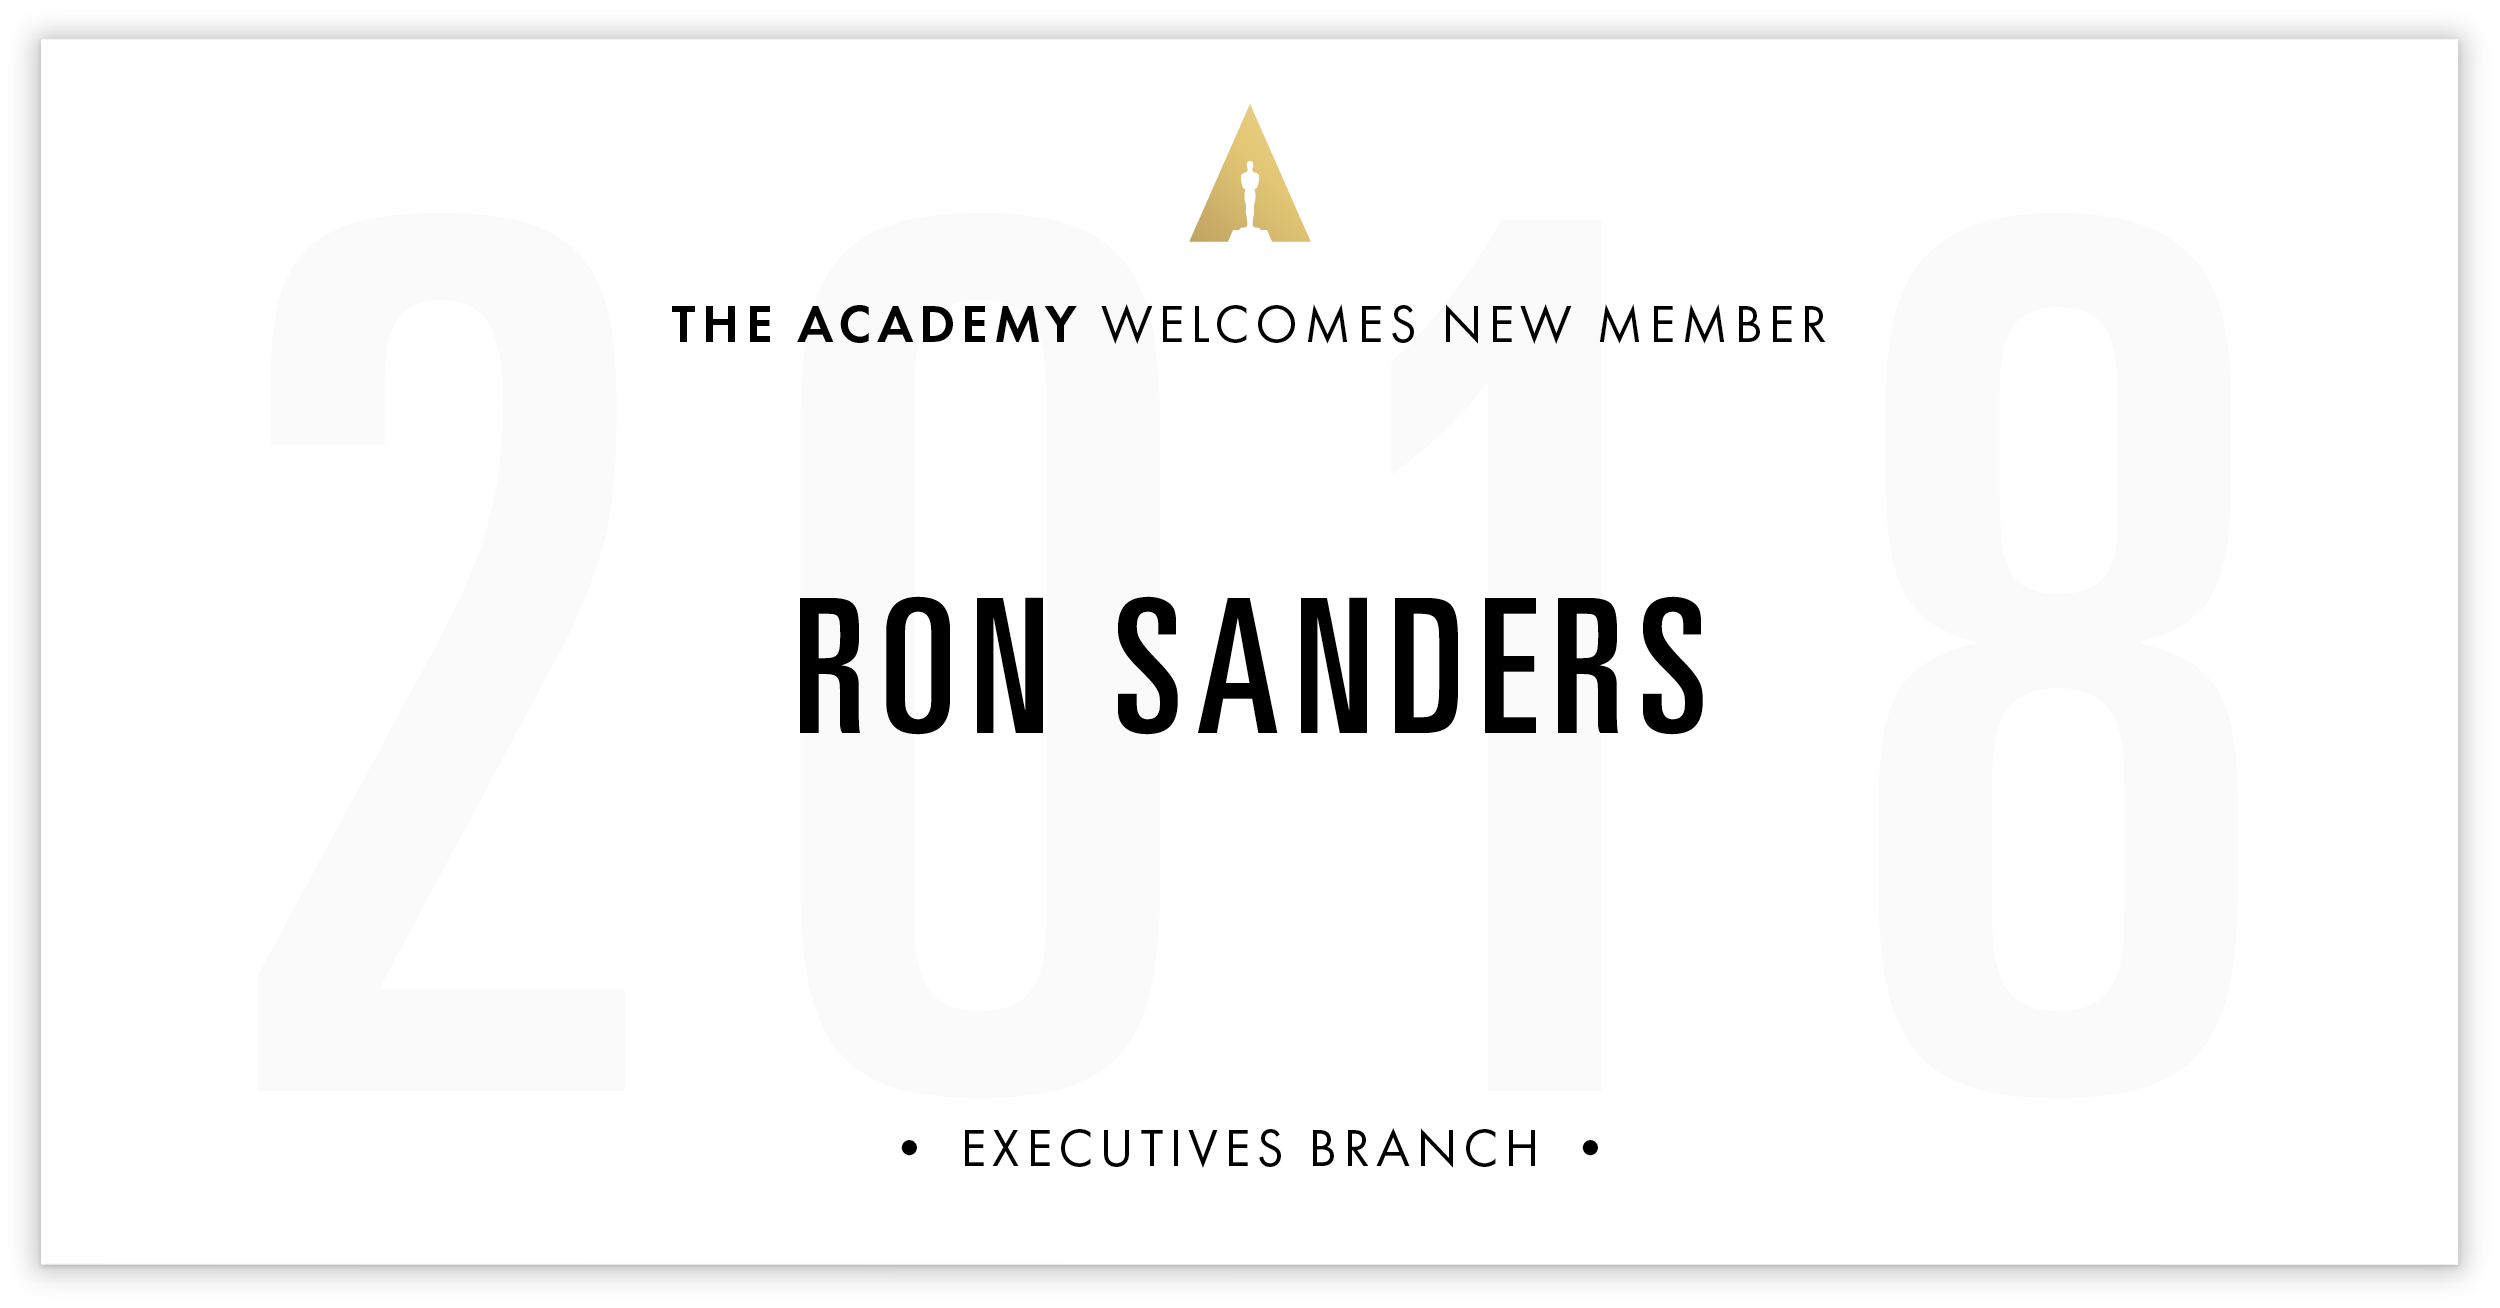 Ron Sanders is invited!